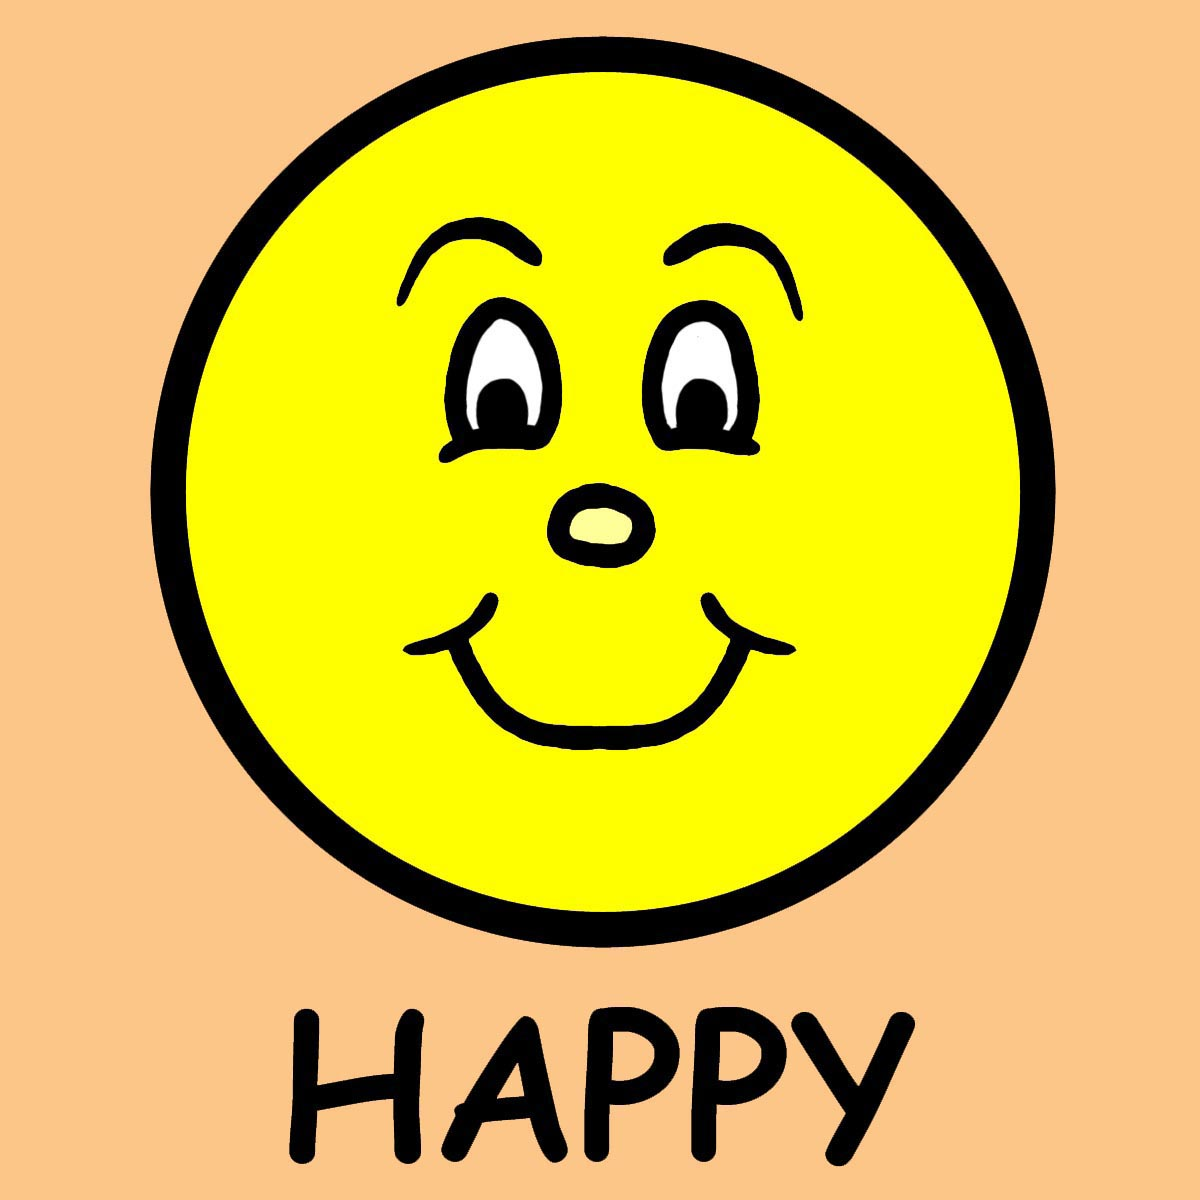 happy clip art clipart panda free clipart images rh clipartpanda com happy clip art pictures happy clip art images